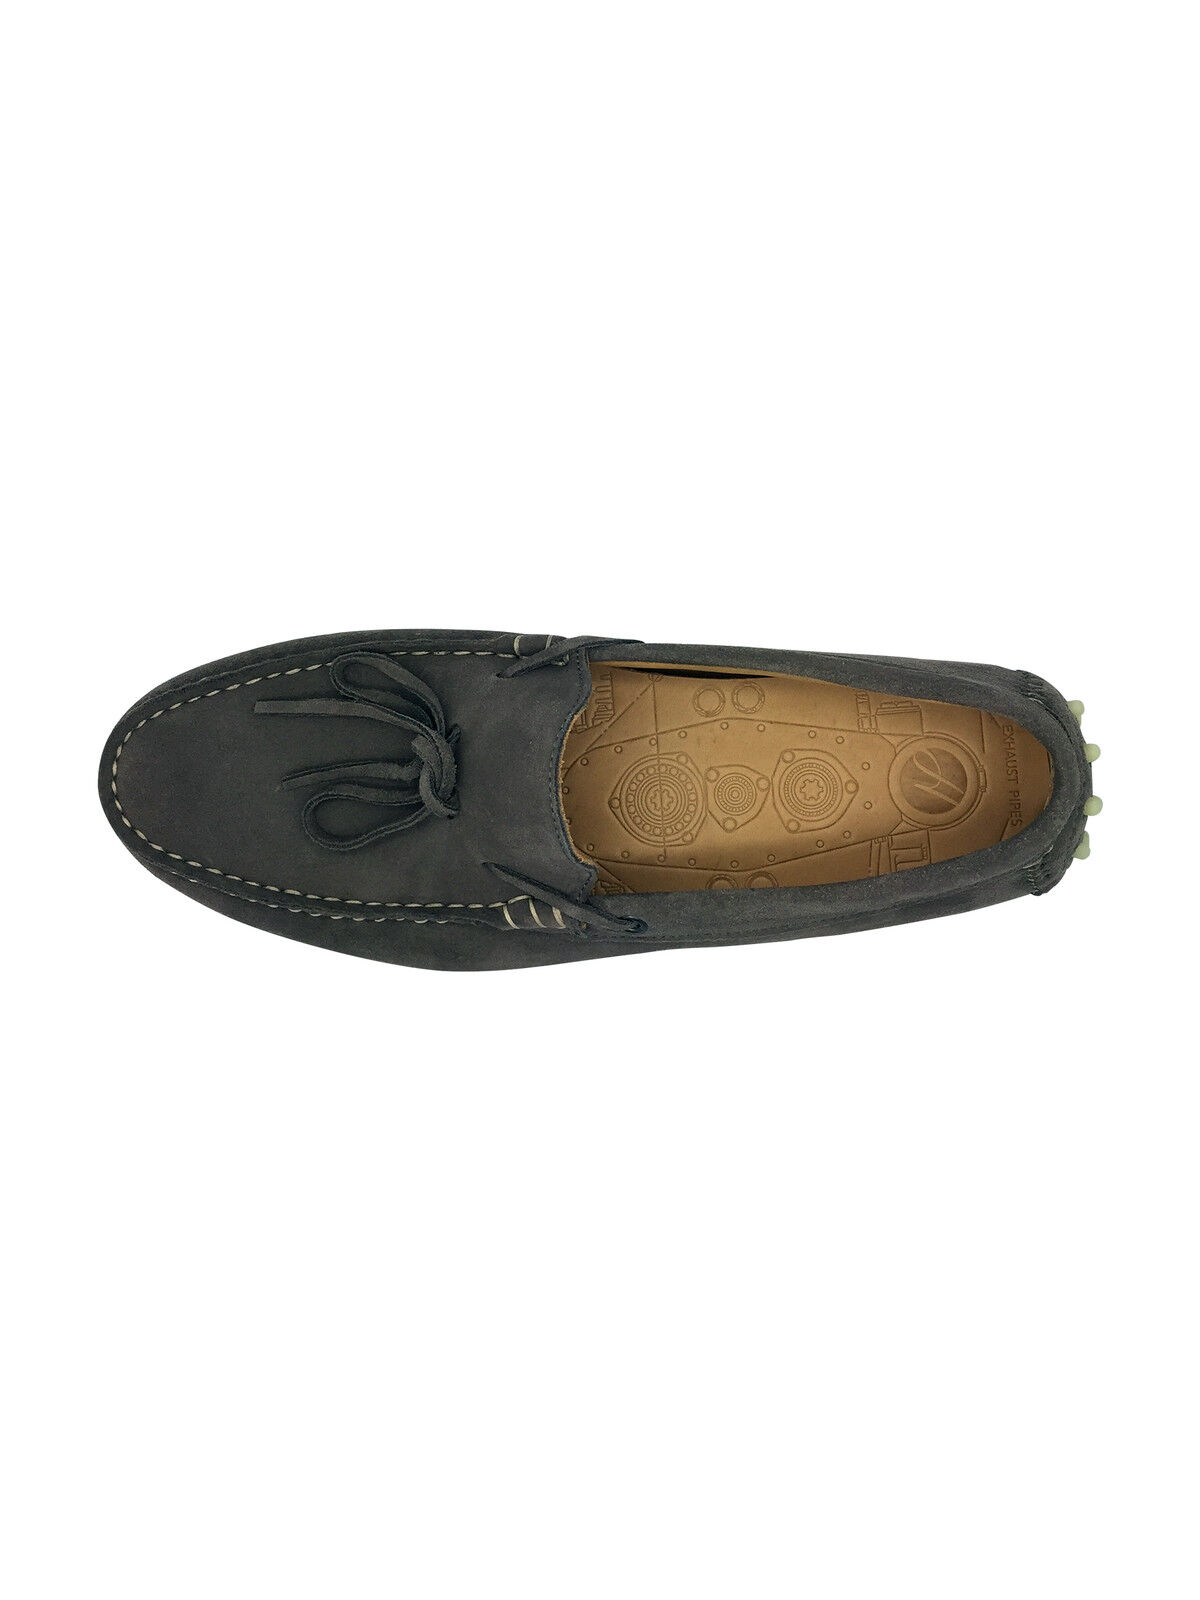 Ausverkauf Schuhe Wildleder Hudson Ricardo Slipper ohne Bügel graue Schuhe Ausverkauf UK 9 EU 43 64aeed